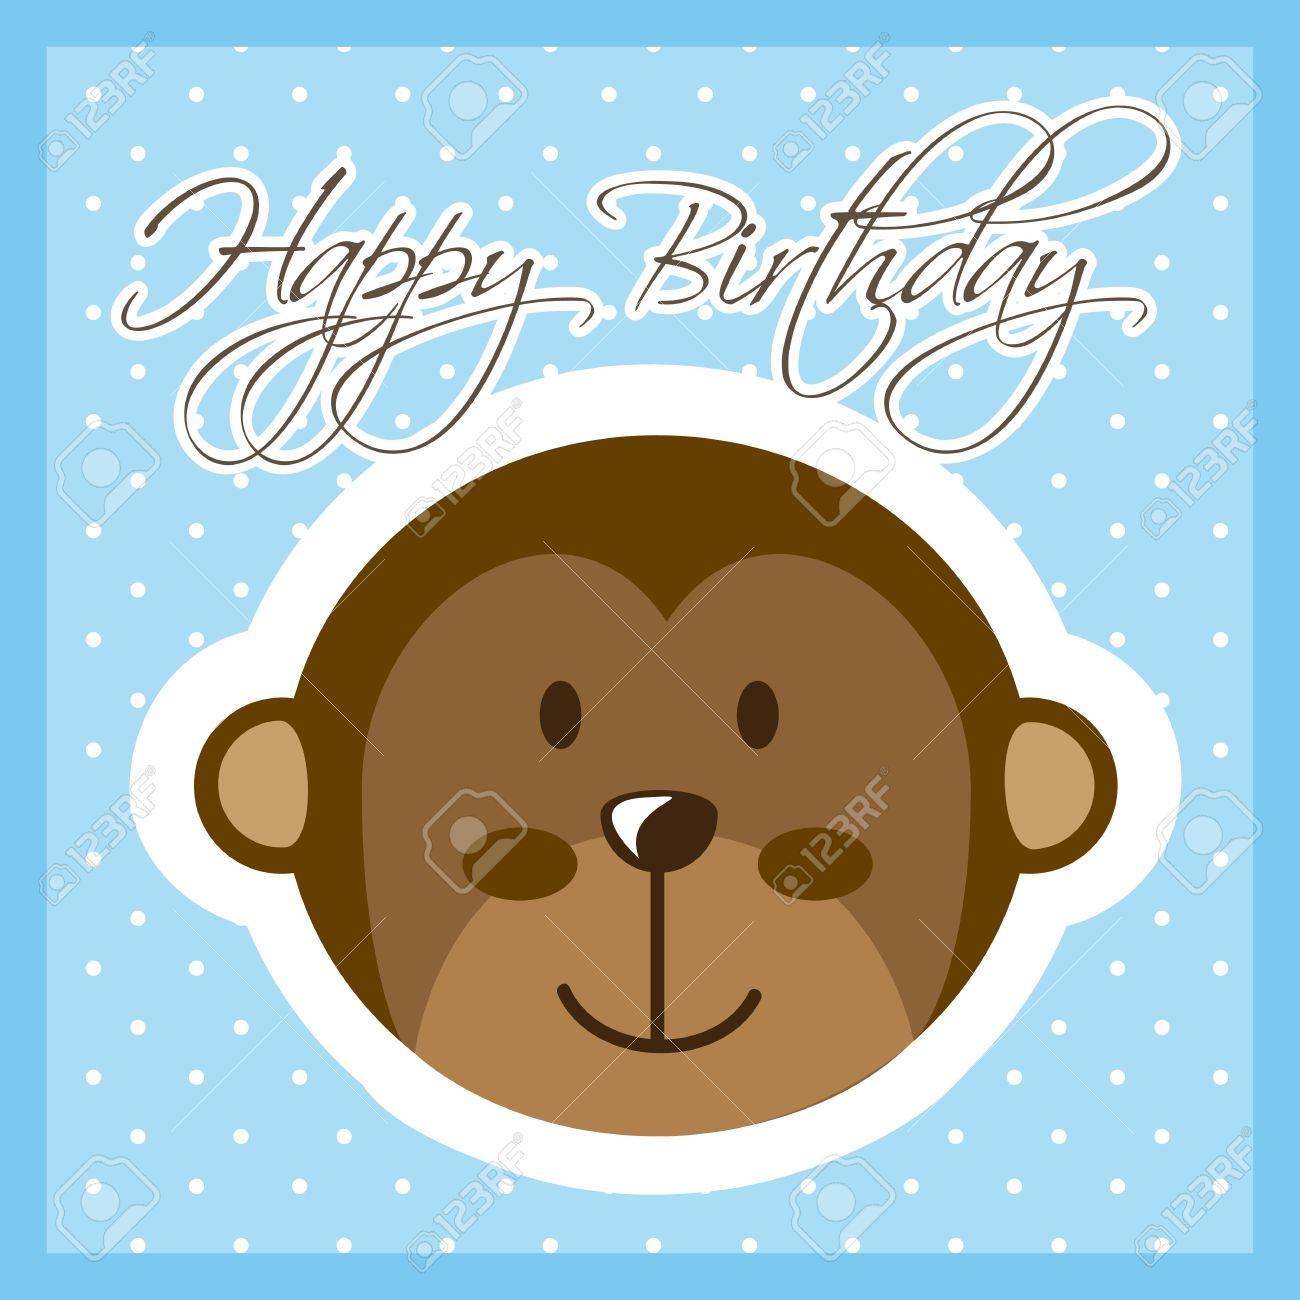 Happy Birthday Card With Monkey Vector Illustration Royalty Free – Monkey Birthday Card